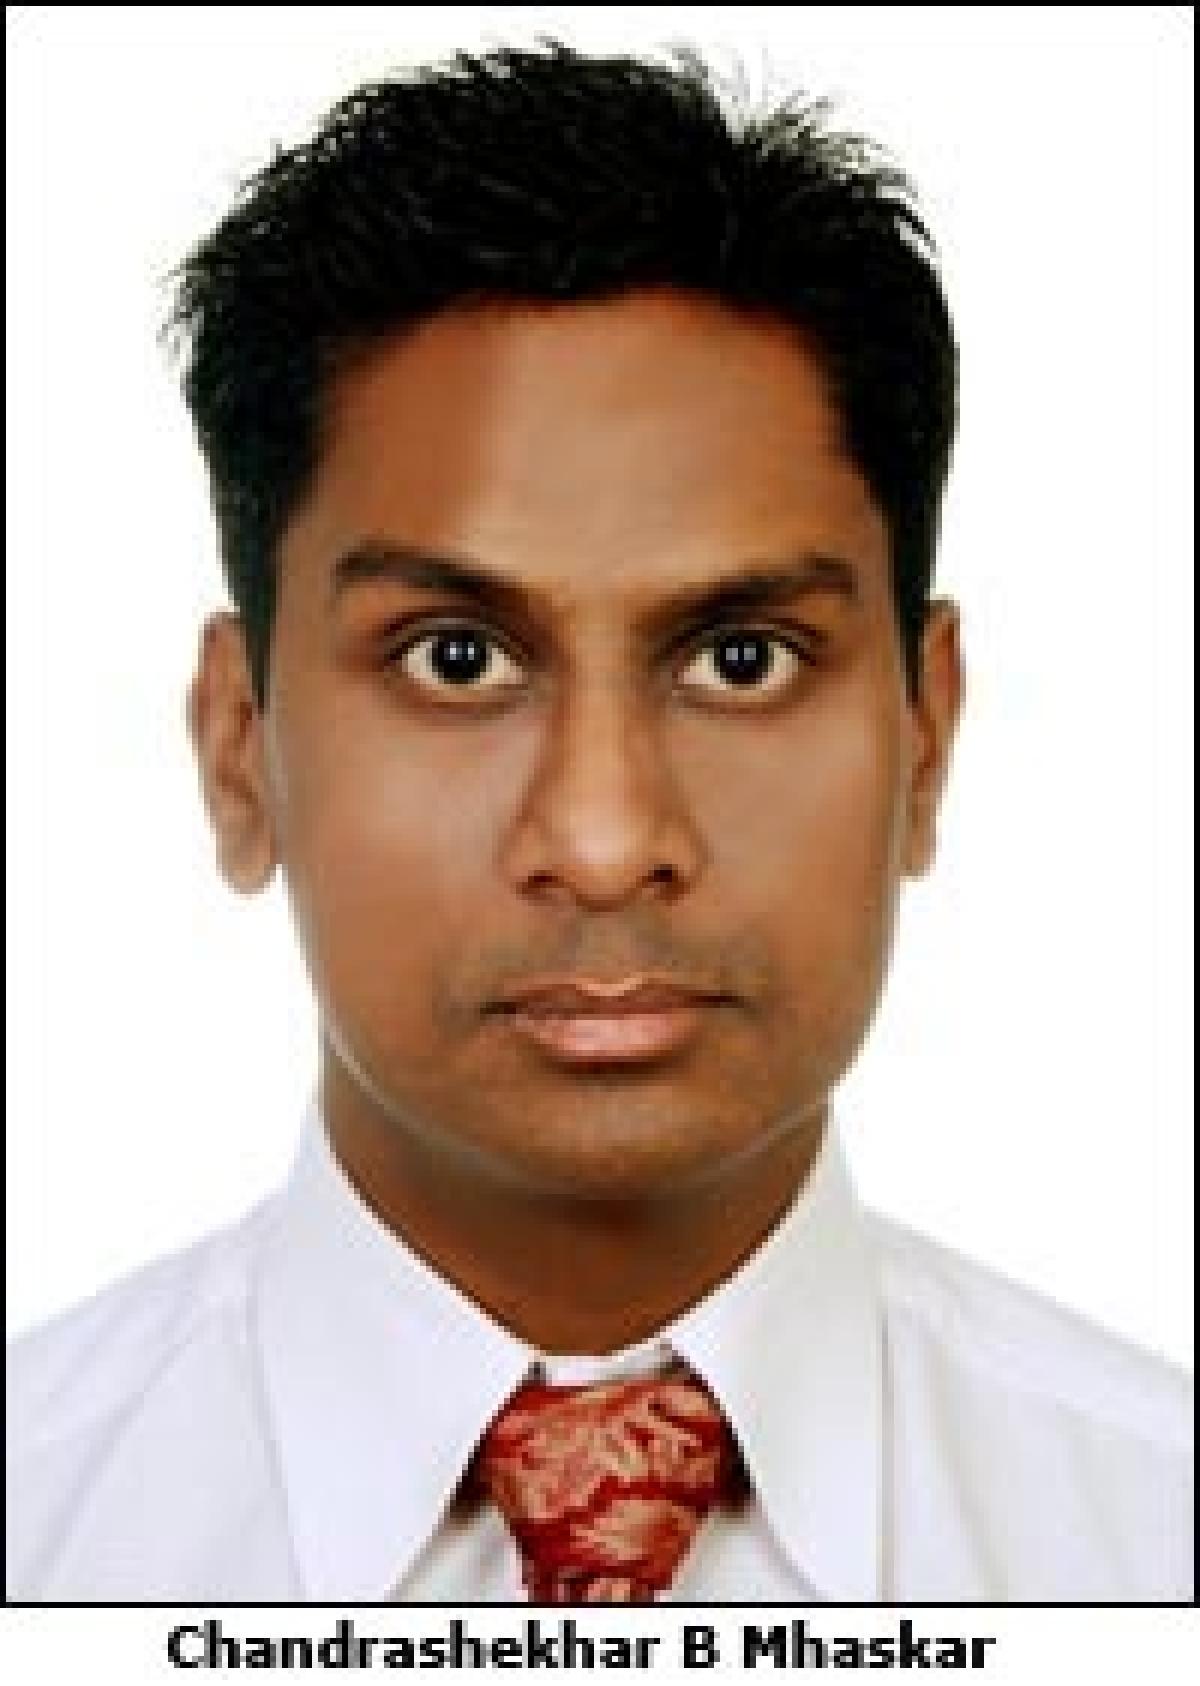 Cheil Worldwide SW Asia appoints Chandrashekhar B Mhaskar as general manager, India